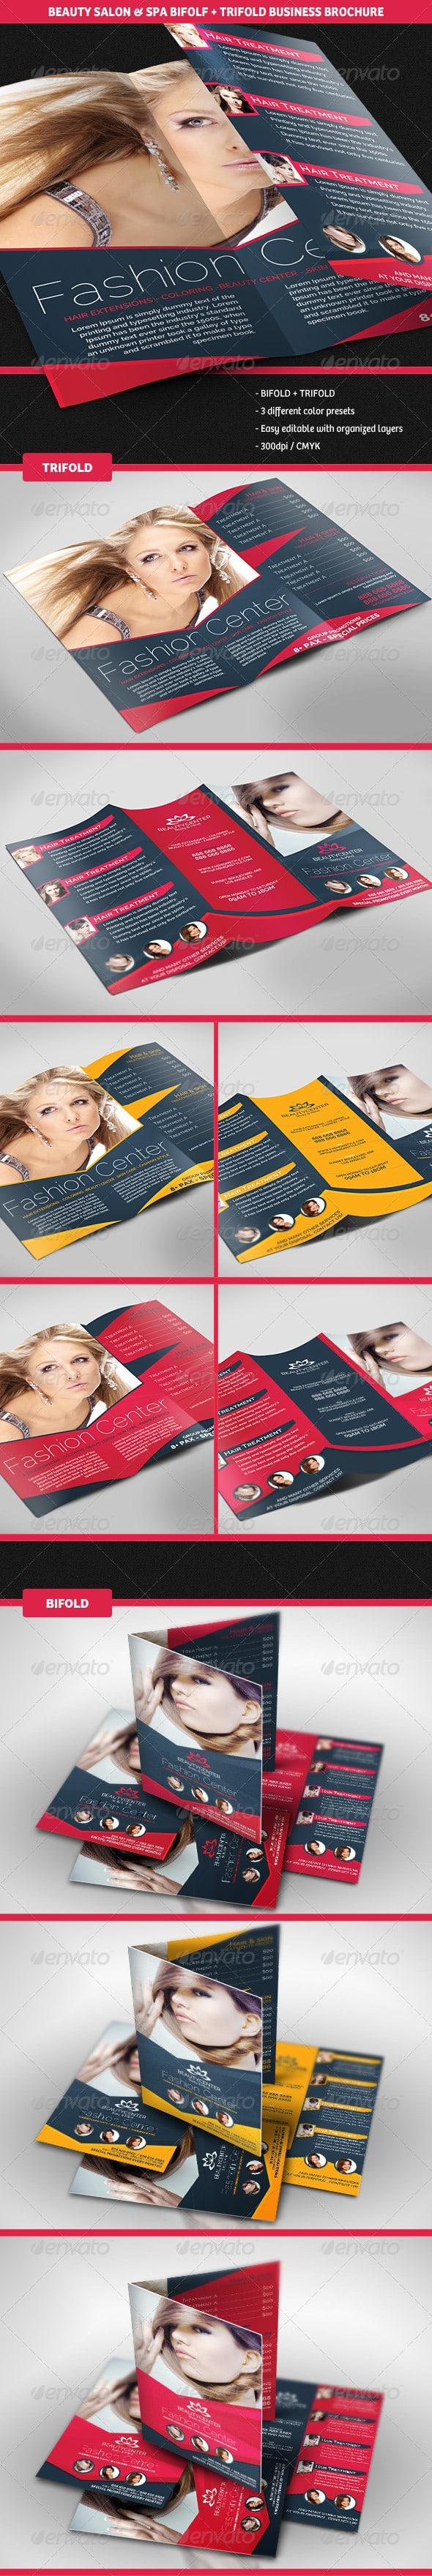 Beauty Center Bifold + Trifold Business Brochures